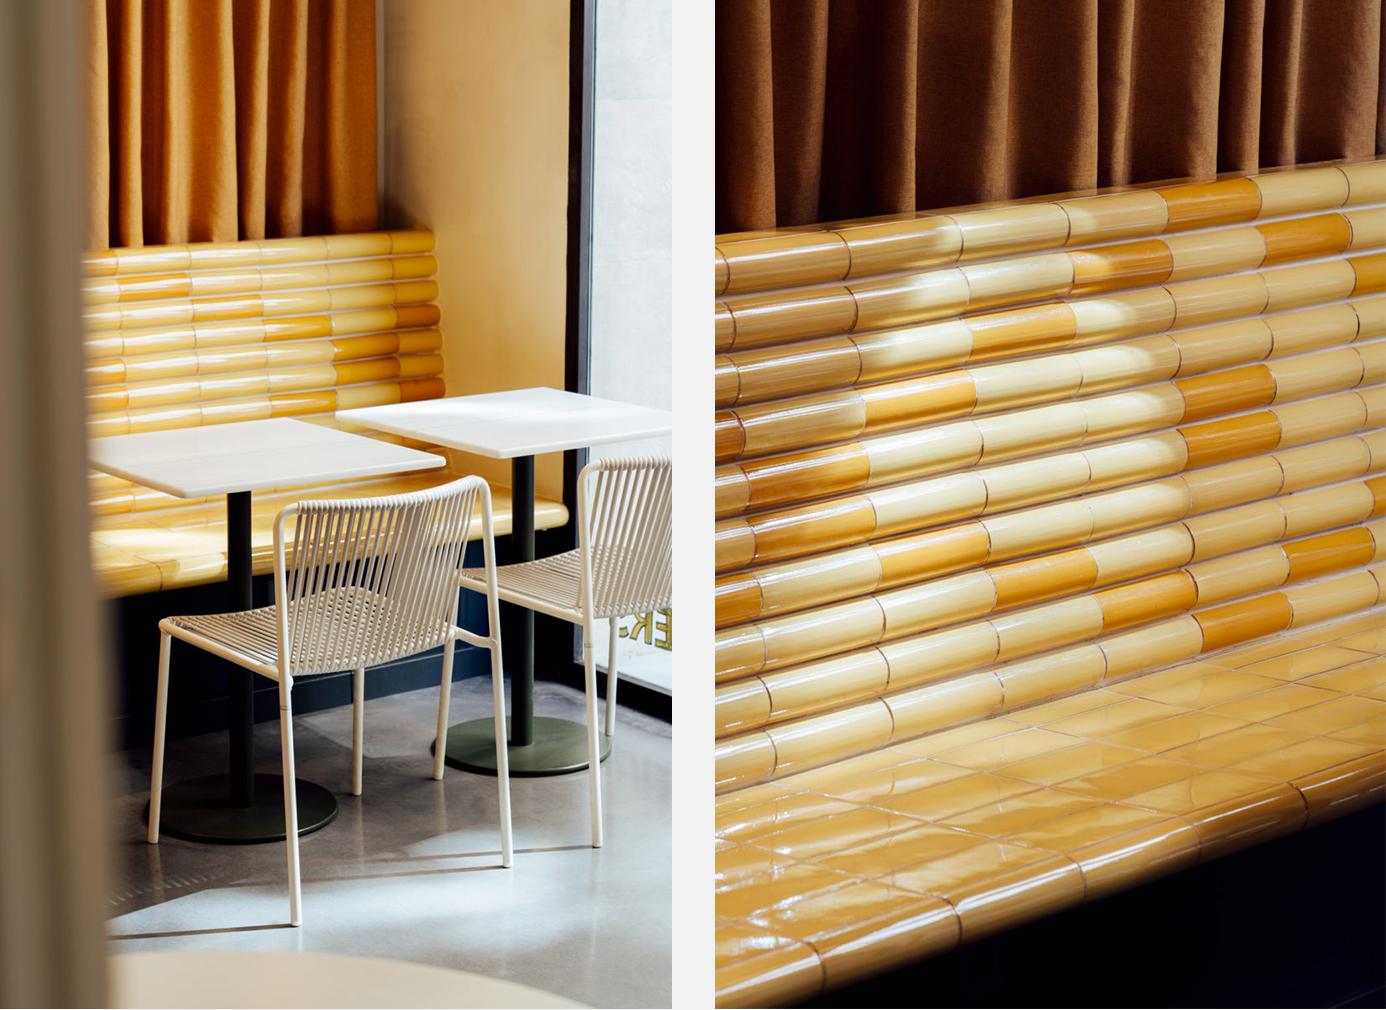 Barcelona's Bunsen restaurant designed by Mesura